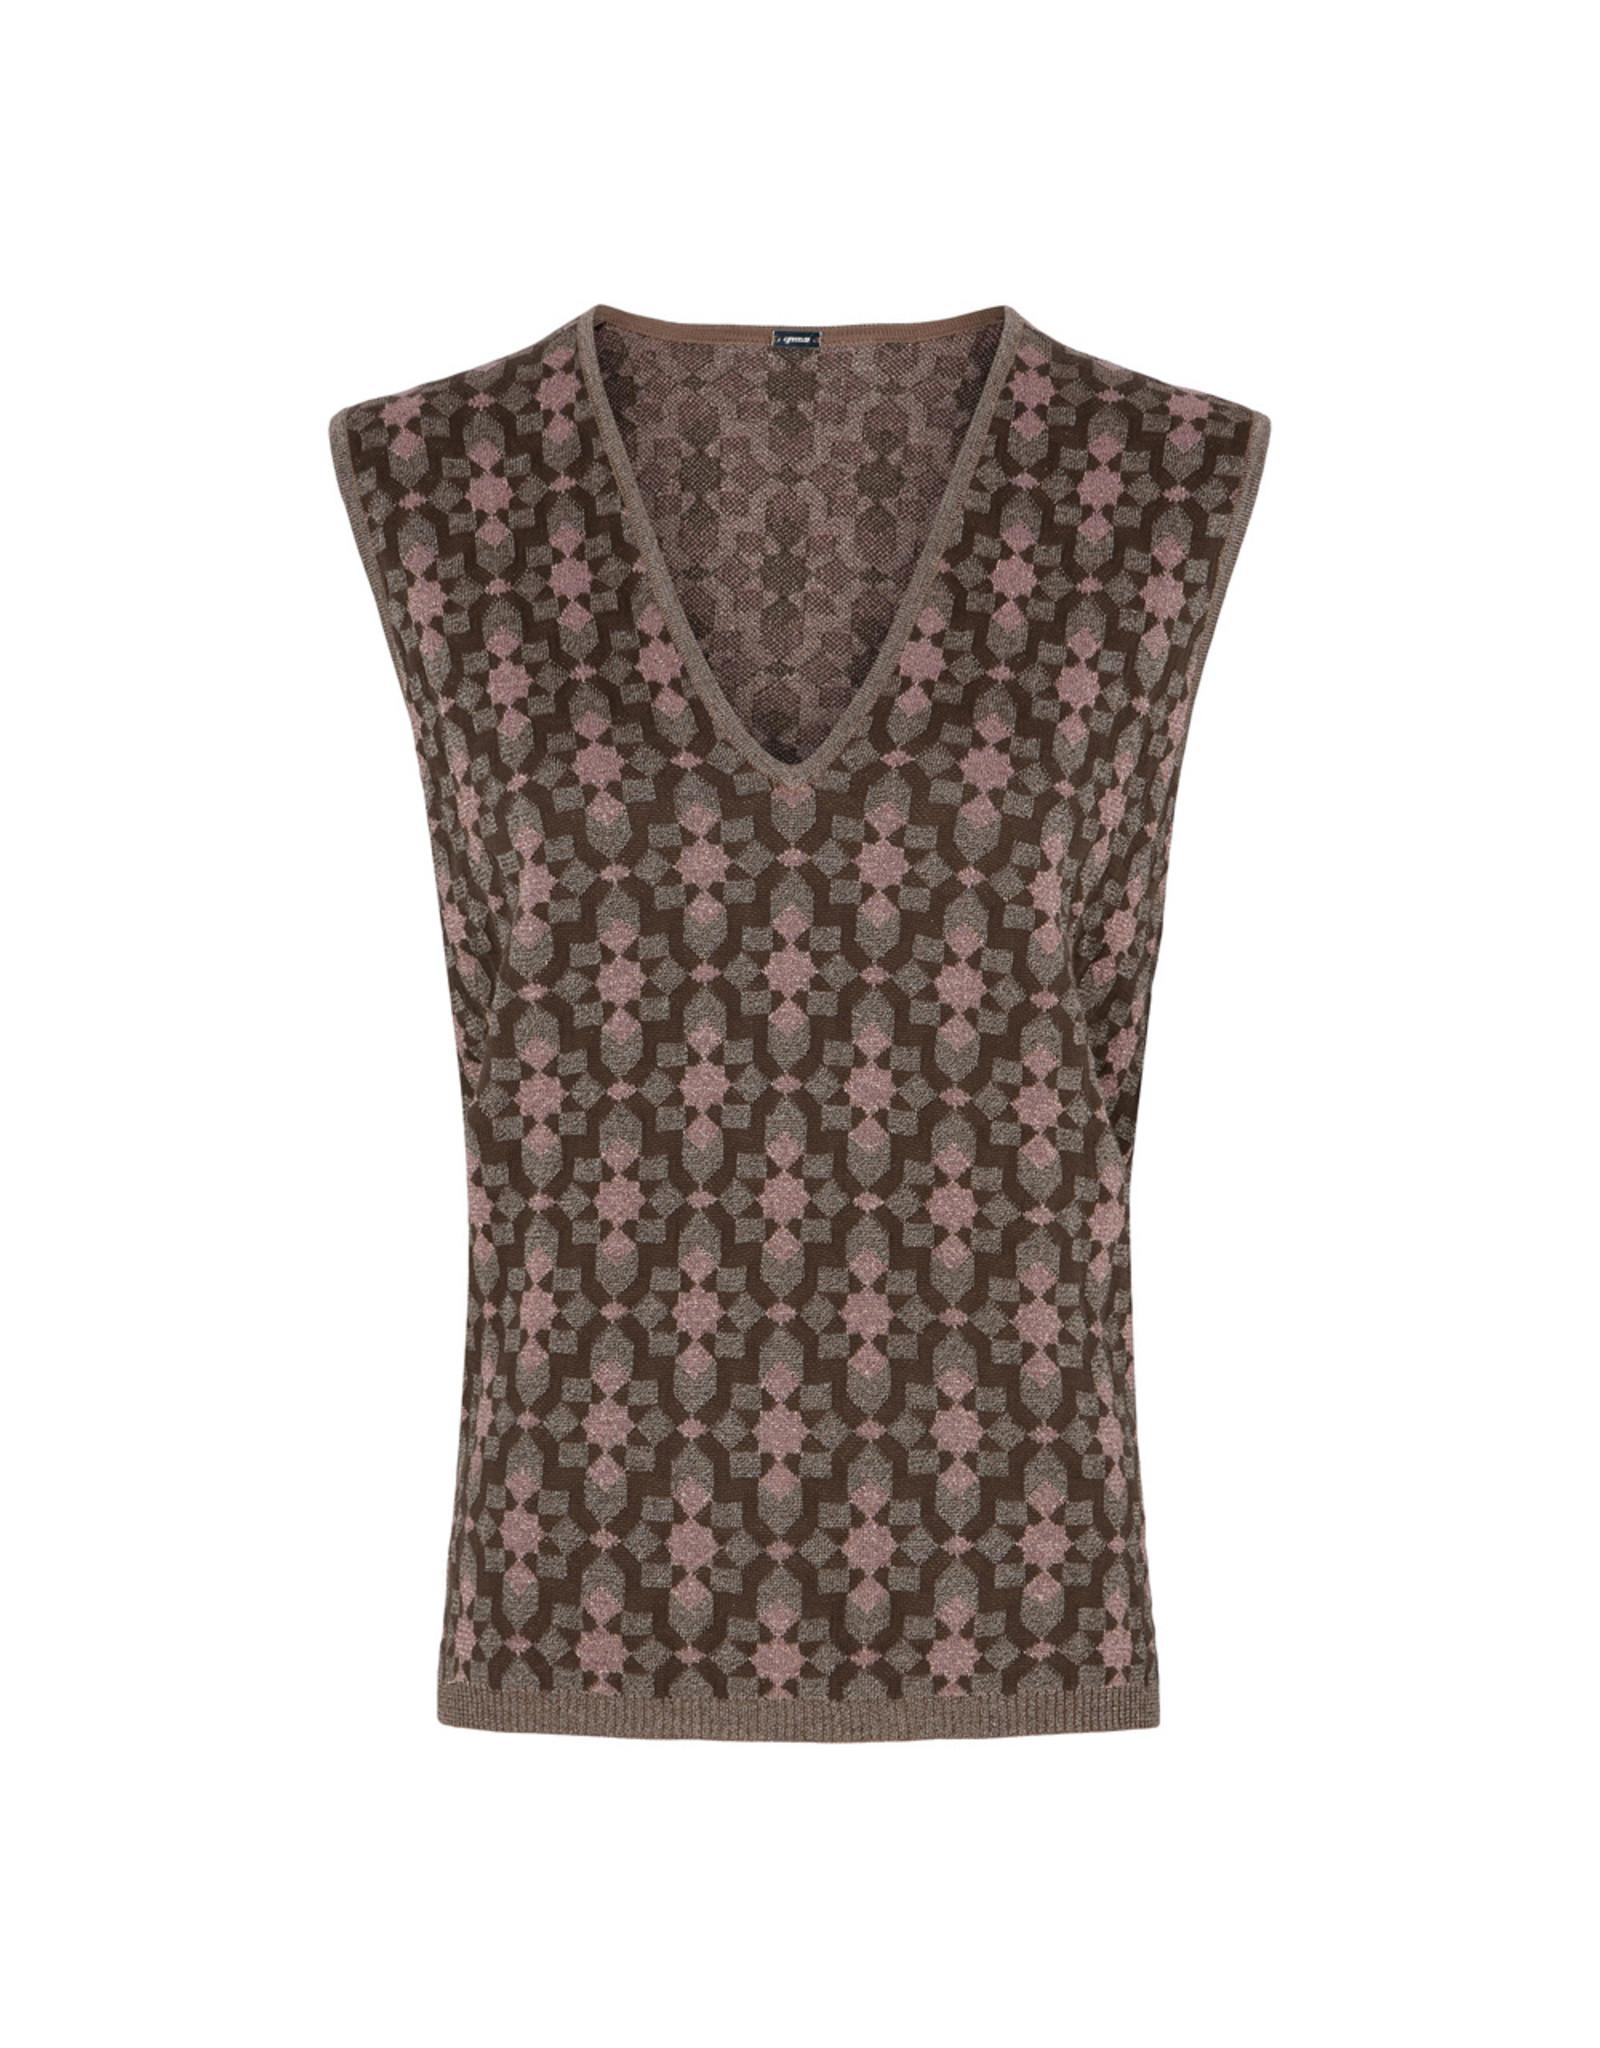 Gustav Jian knit vest